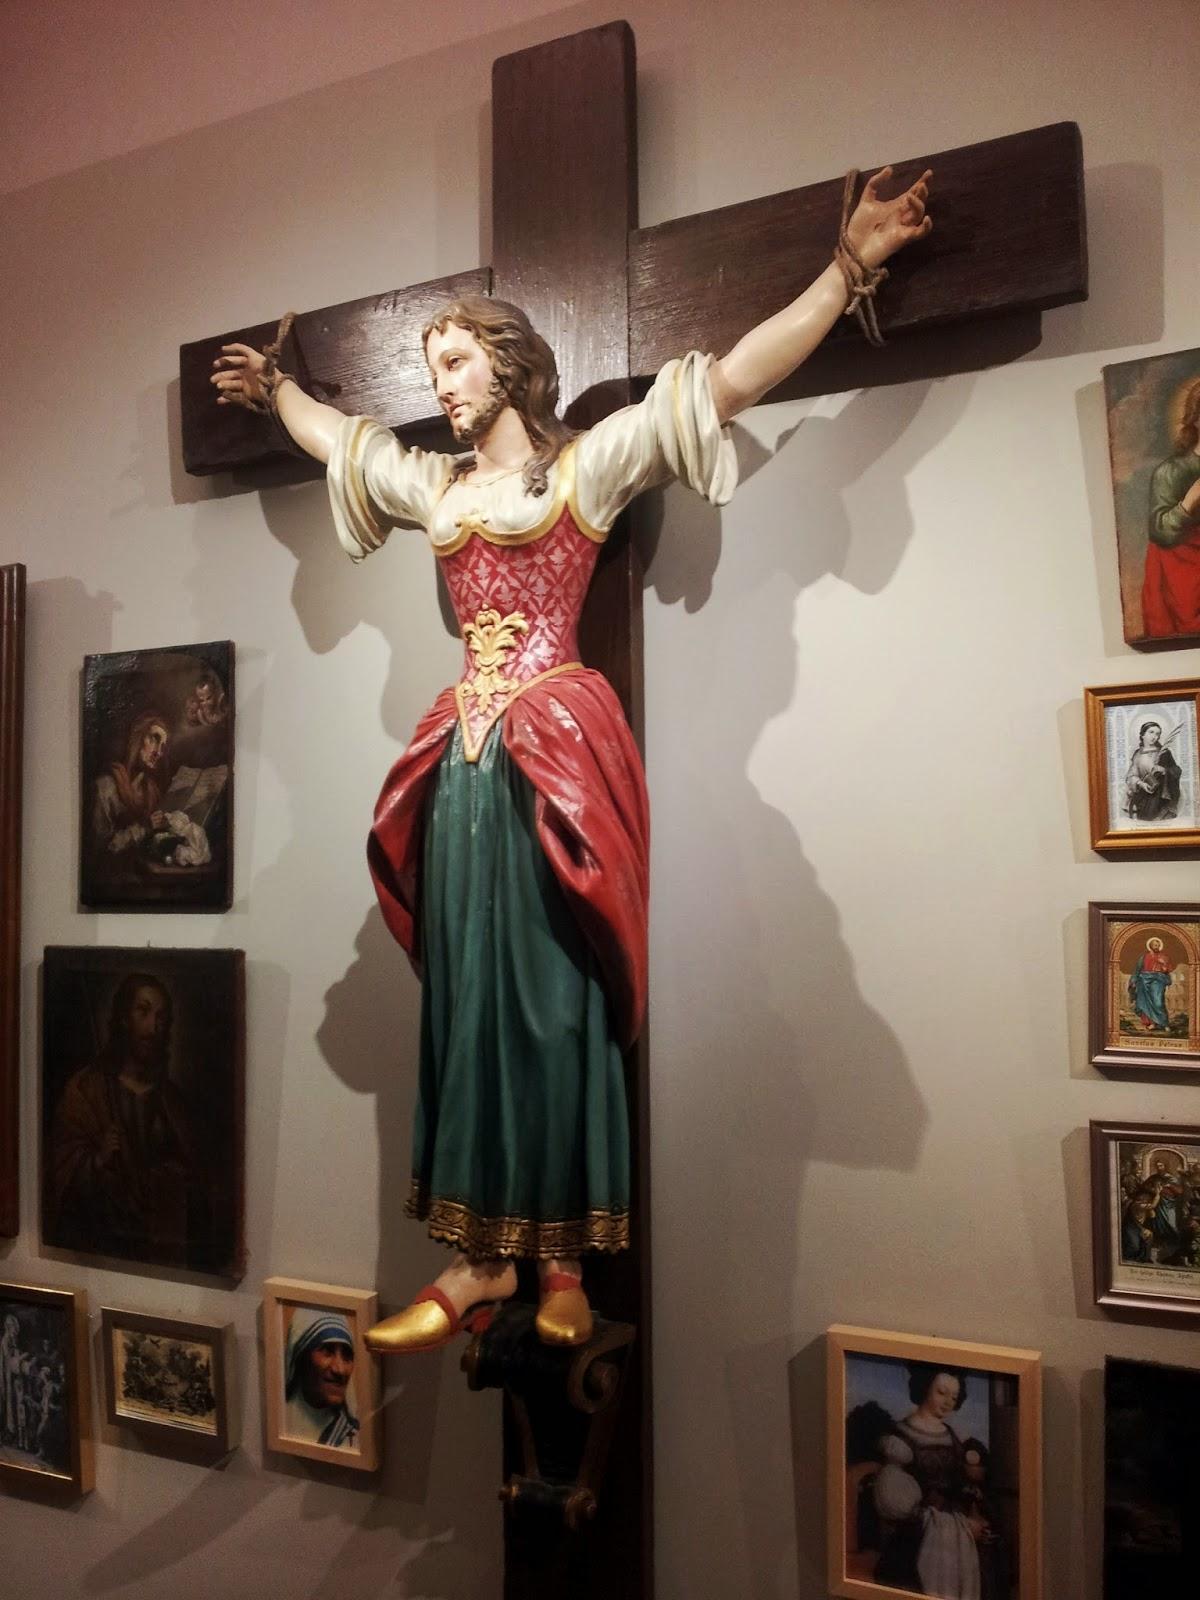 santa wilgefortis conchita wurst mujeres crucificadas